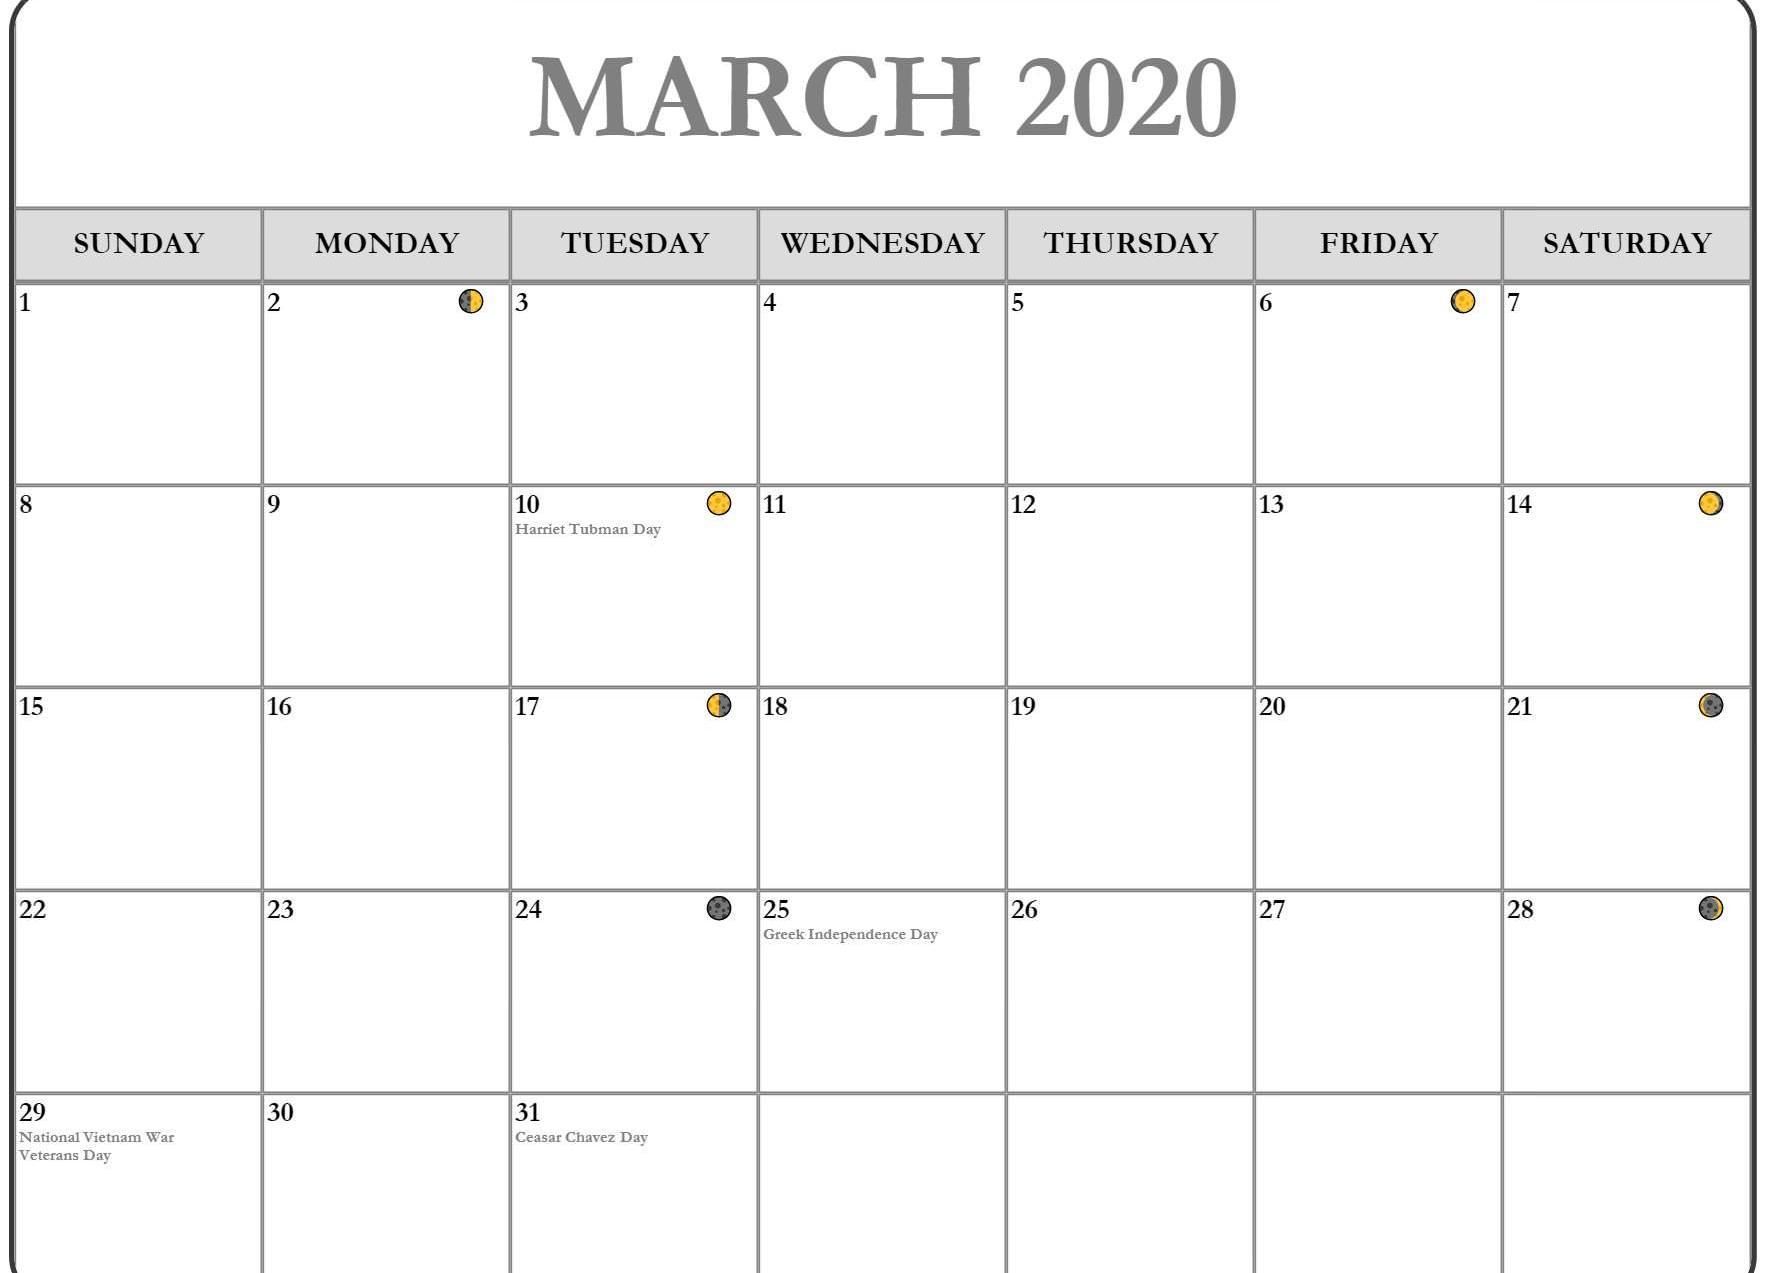 March 2020 Calendar With Holidays Australia